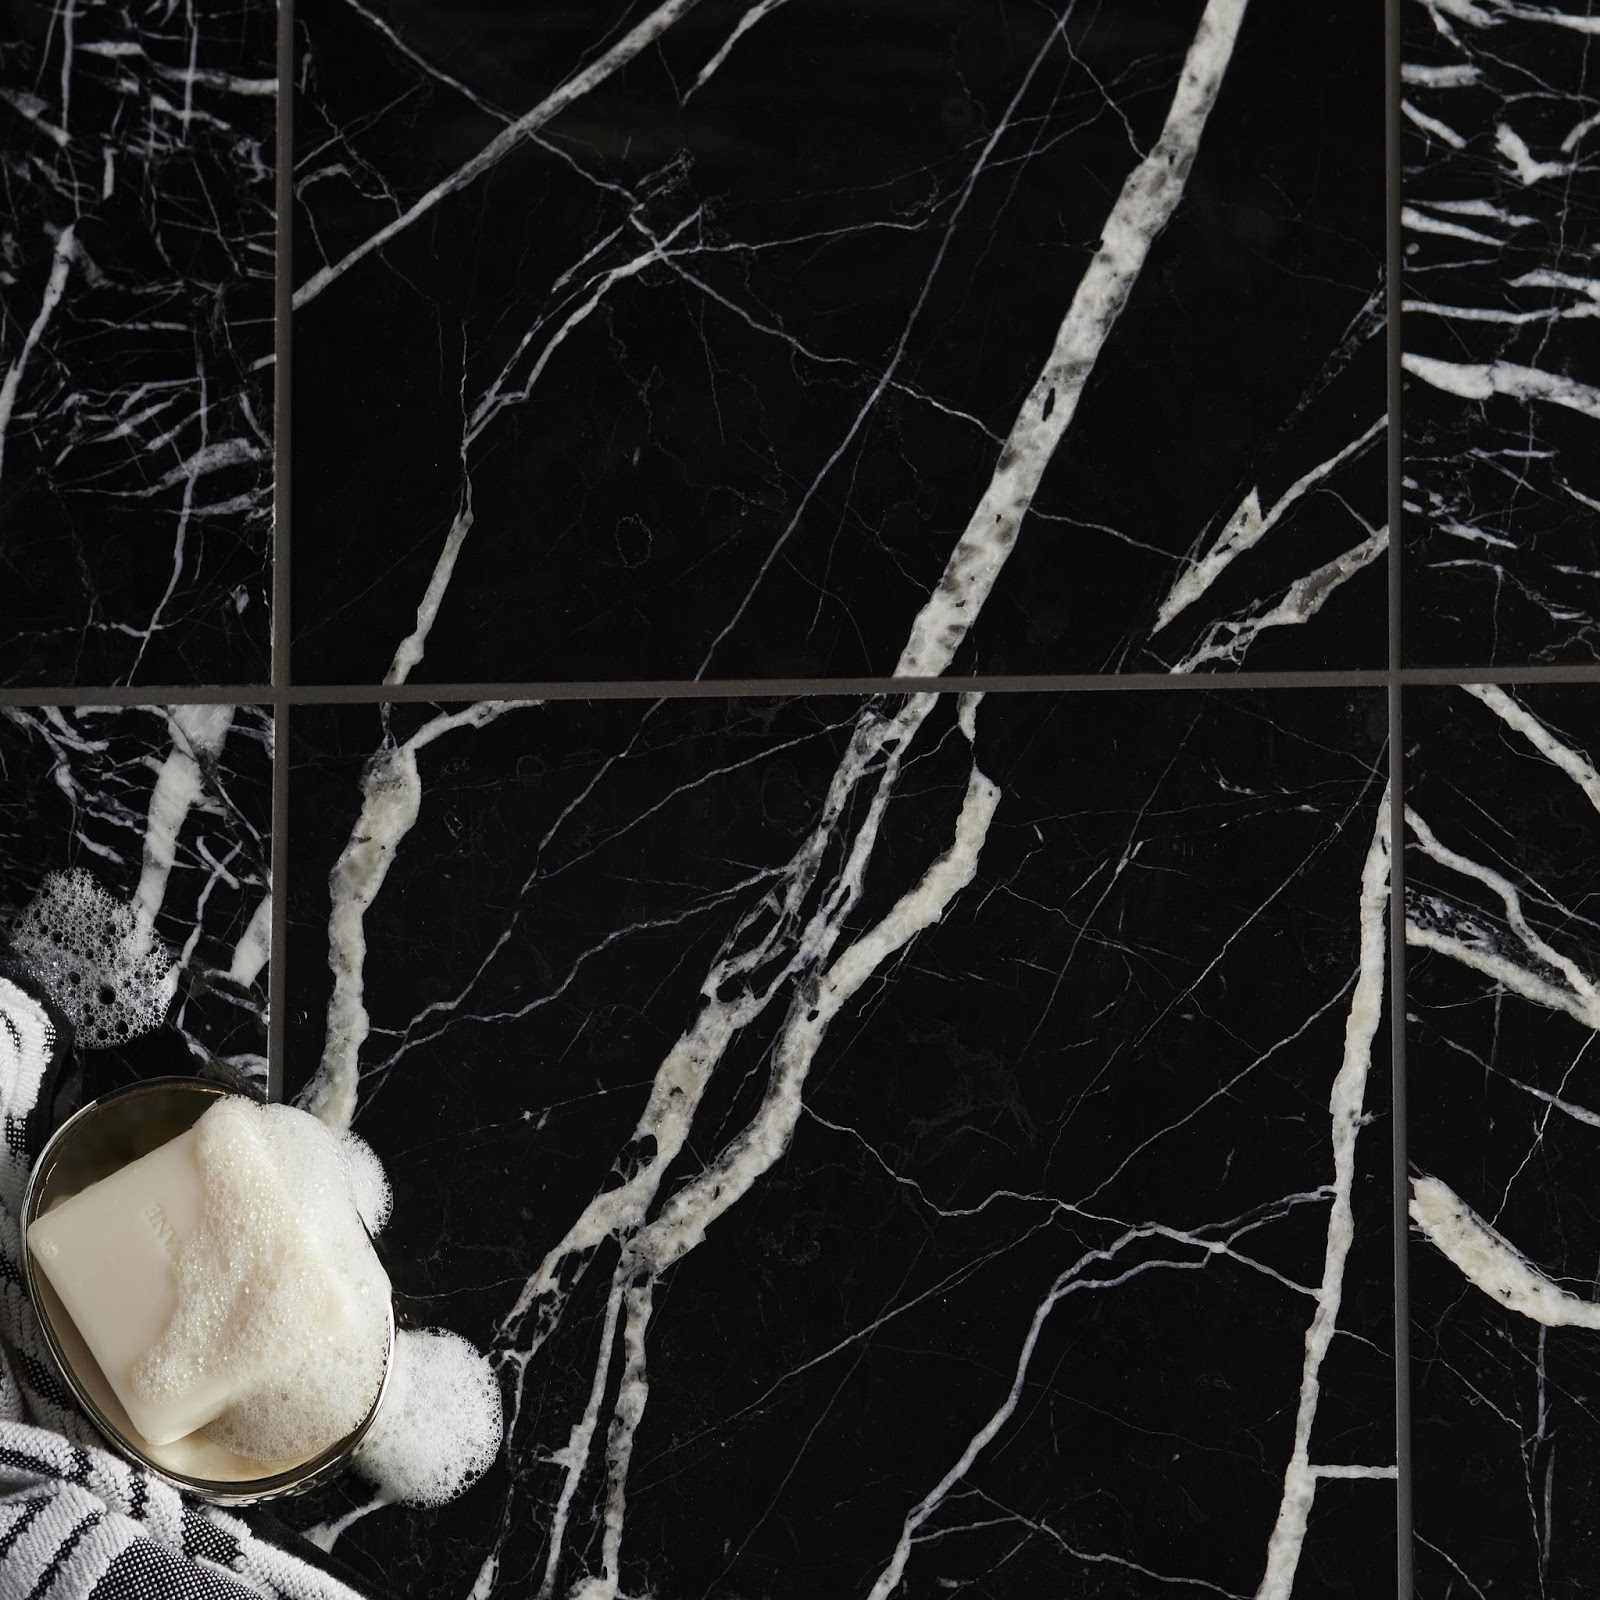 7 Cara Membersihkan Marmer Hitam Sekaligus Mengkilapkannya